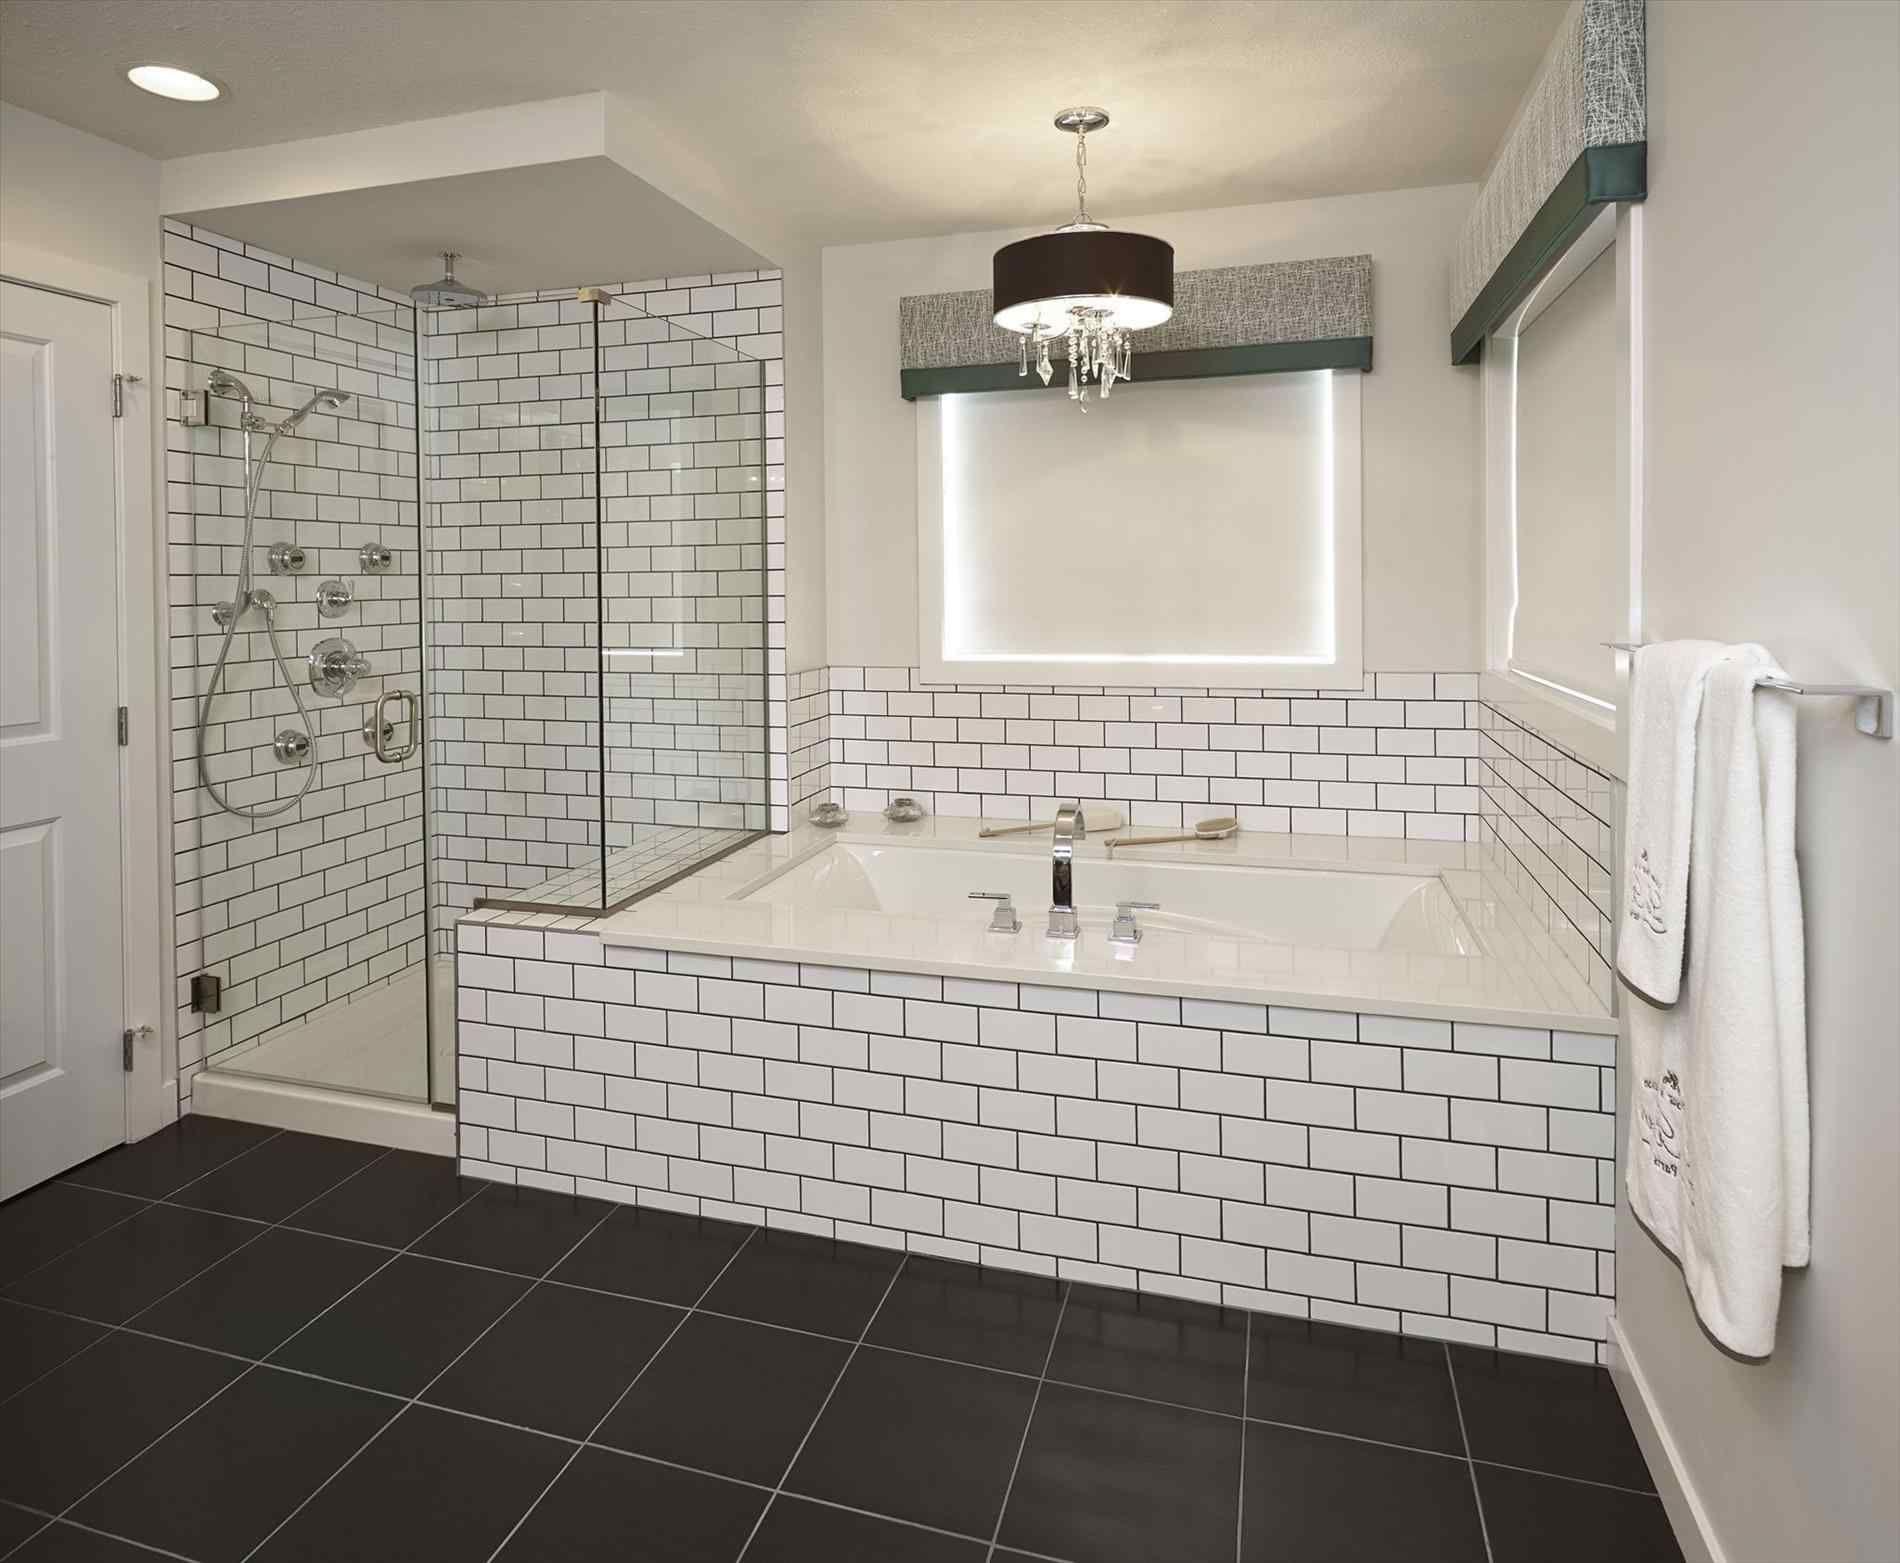 36 Exellent Tiles Subway Decortez White Subway Tile Shower White Bathroom Tiles White Subway Tile Bathroom